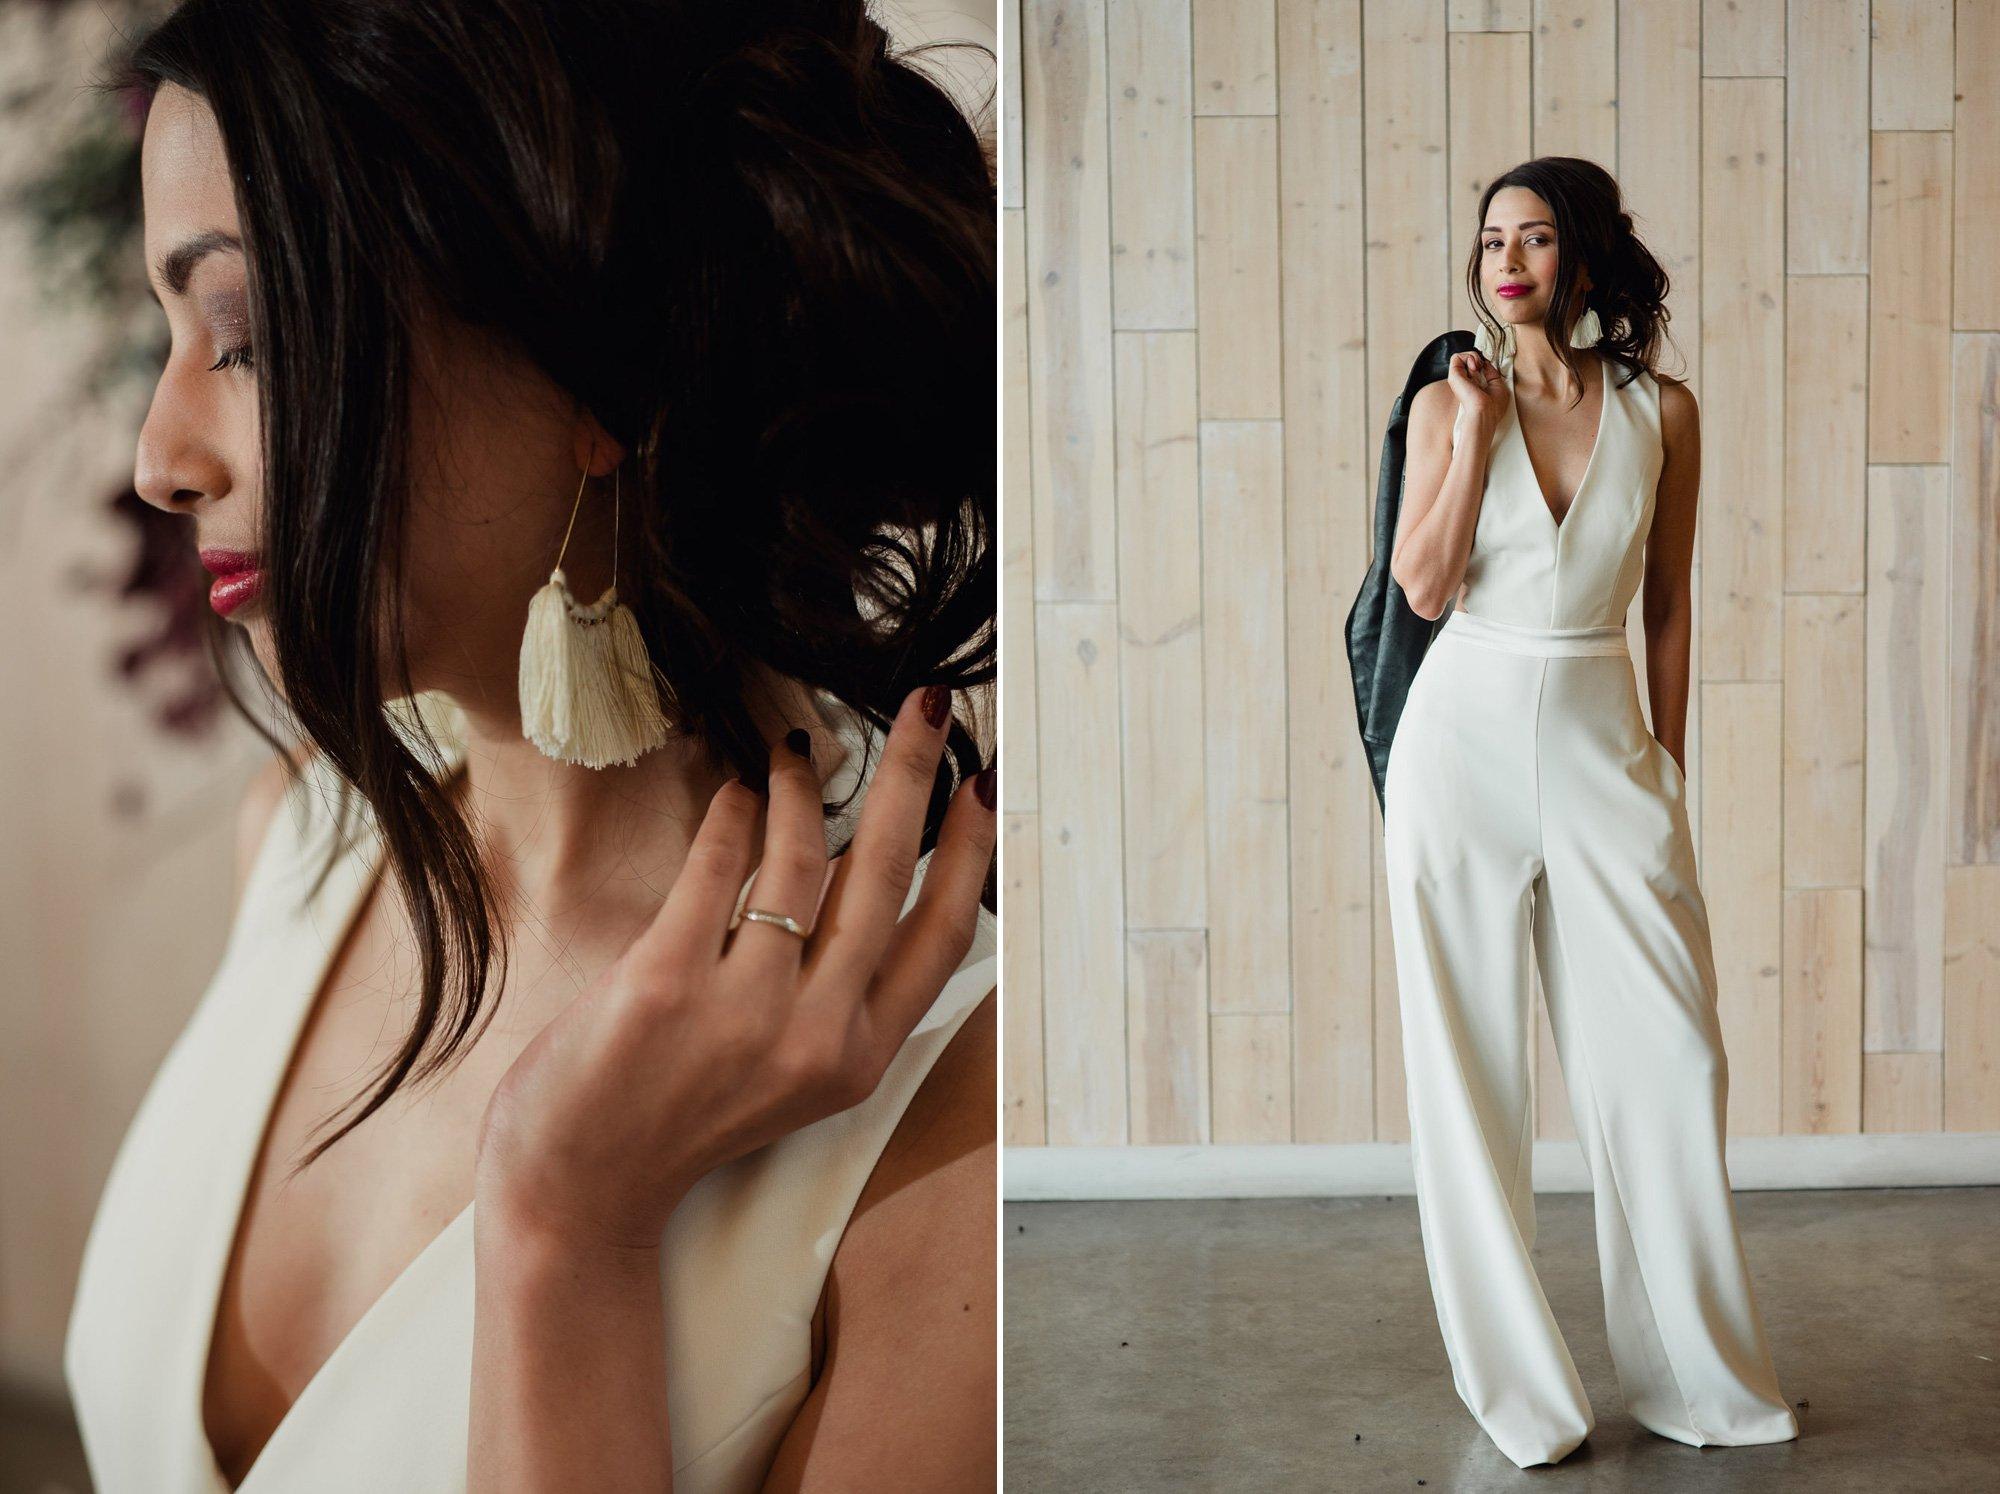 bridal jumpsuit with fringe earrings, alternative bridal looks, alternative wedding styled shoot in austin, peached social house bridal portraits, peached social house styled shoot